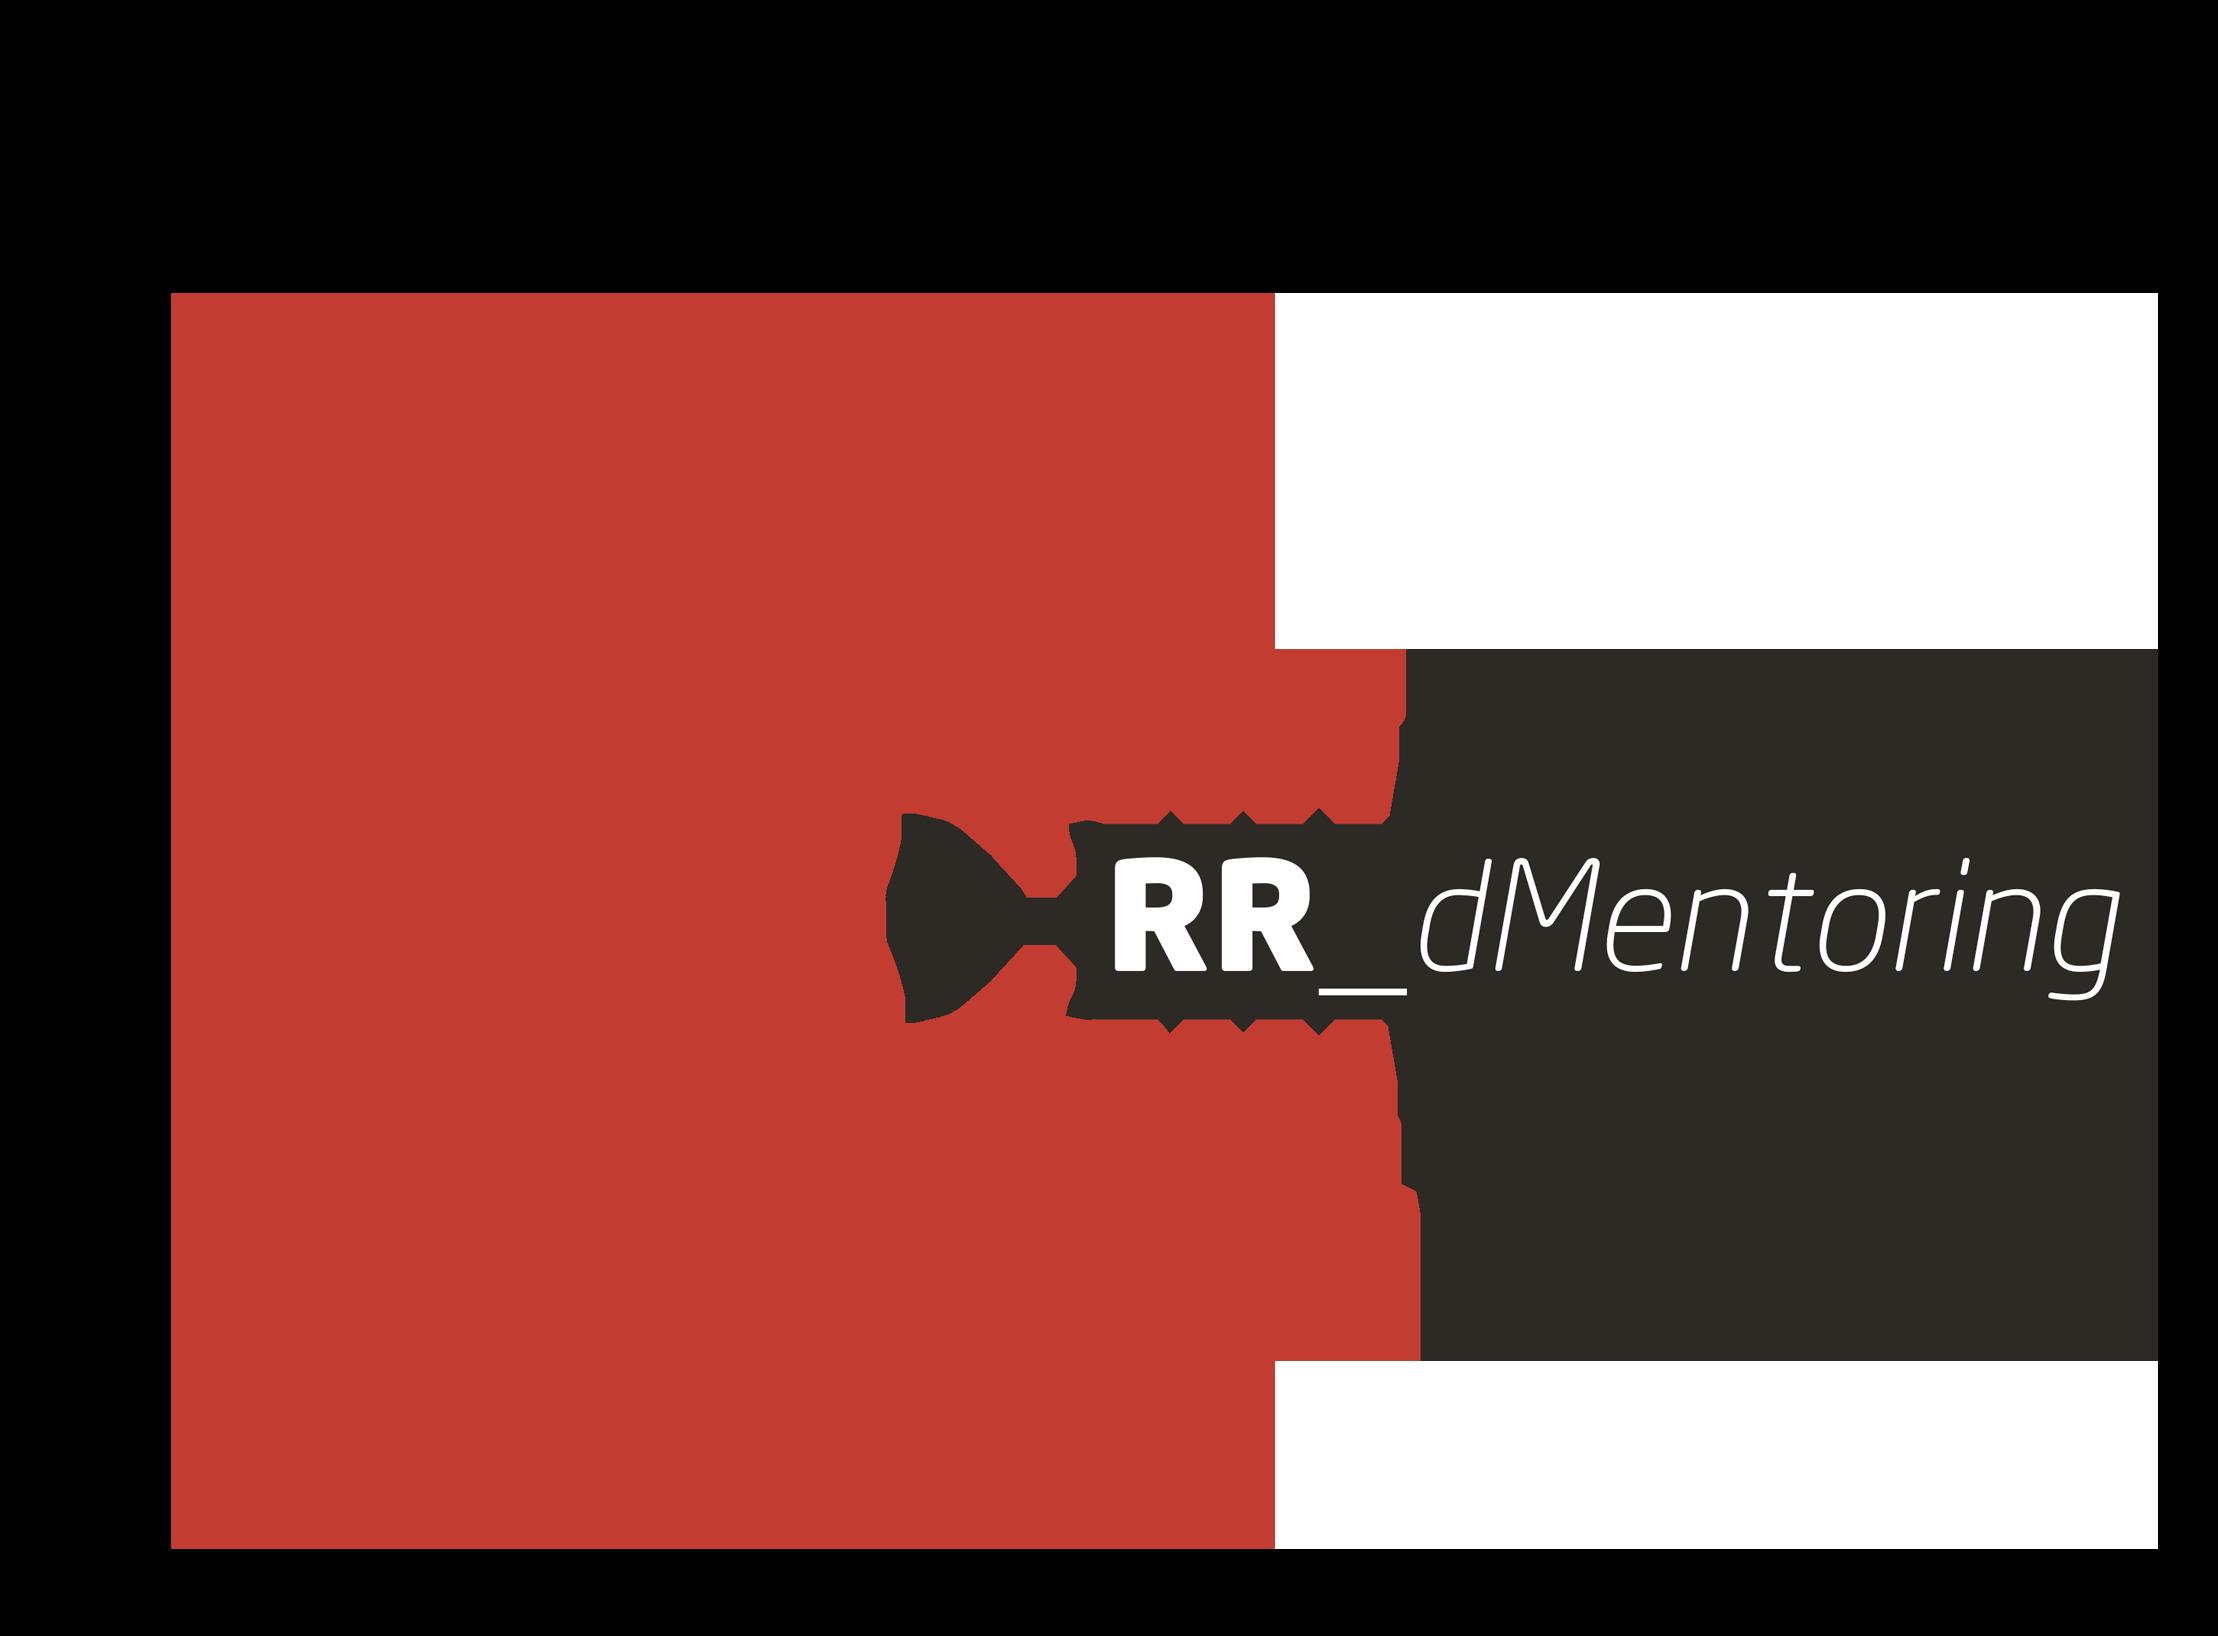 Logo RR_dMentoring